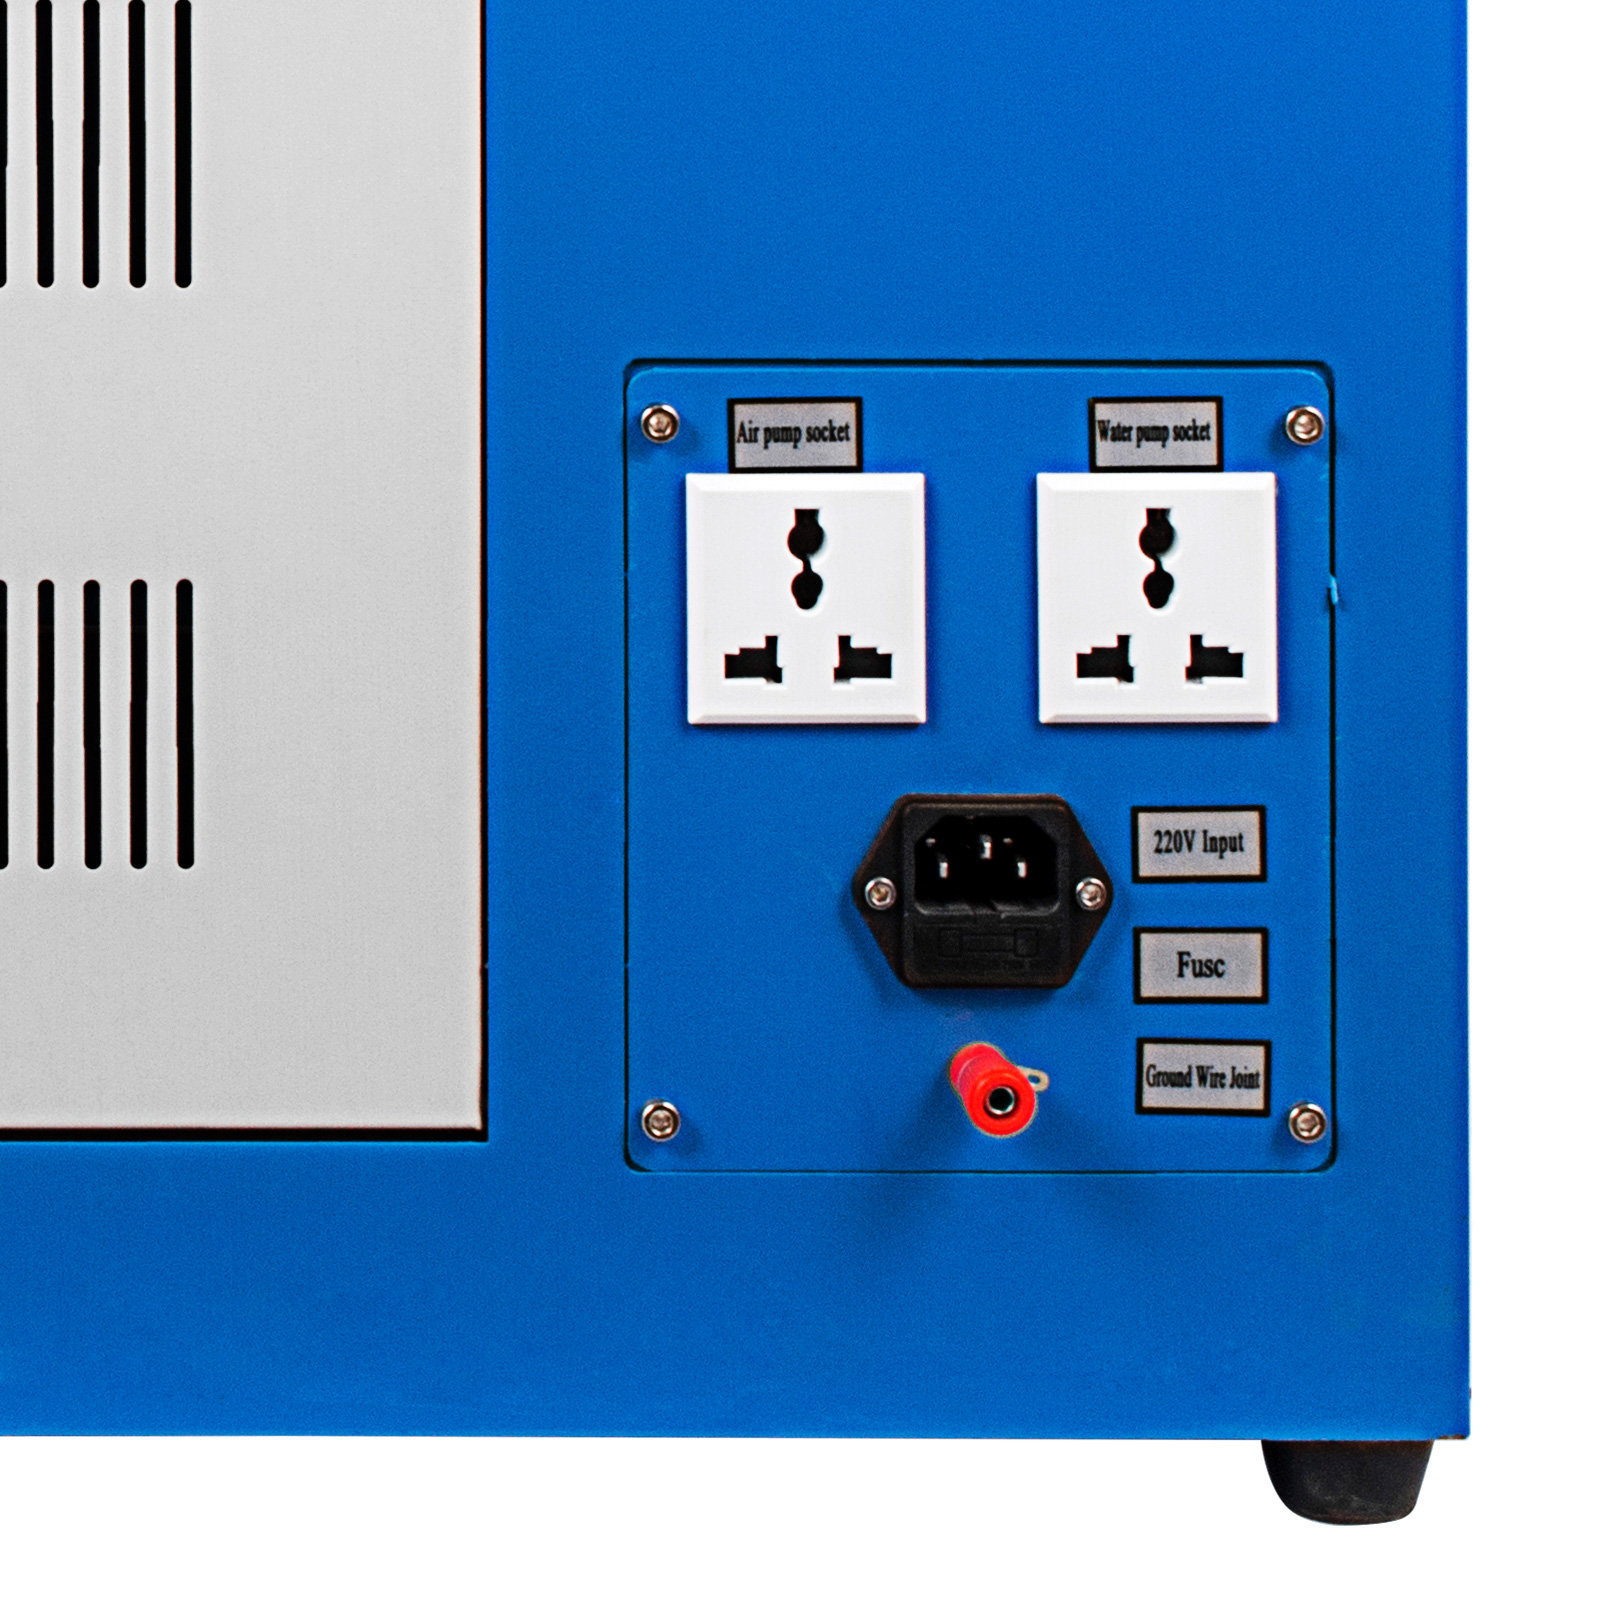 Macchina-per-Incisione-Laser-CO2-40-130W-Asse-Rotante-Tagliatrice-Incisore miniatura 34